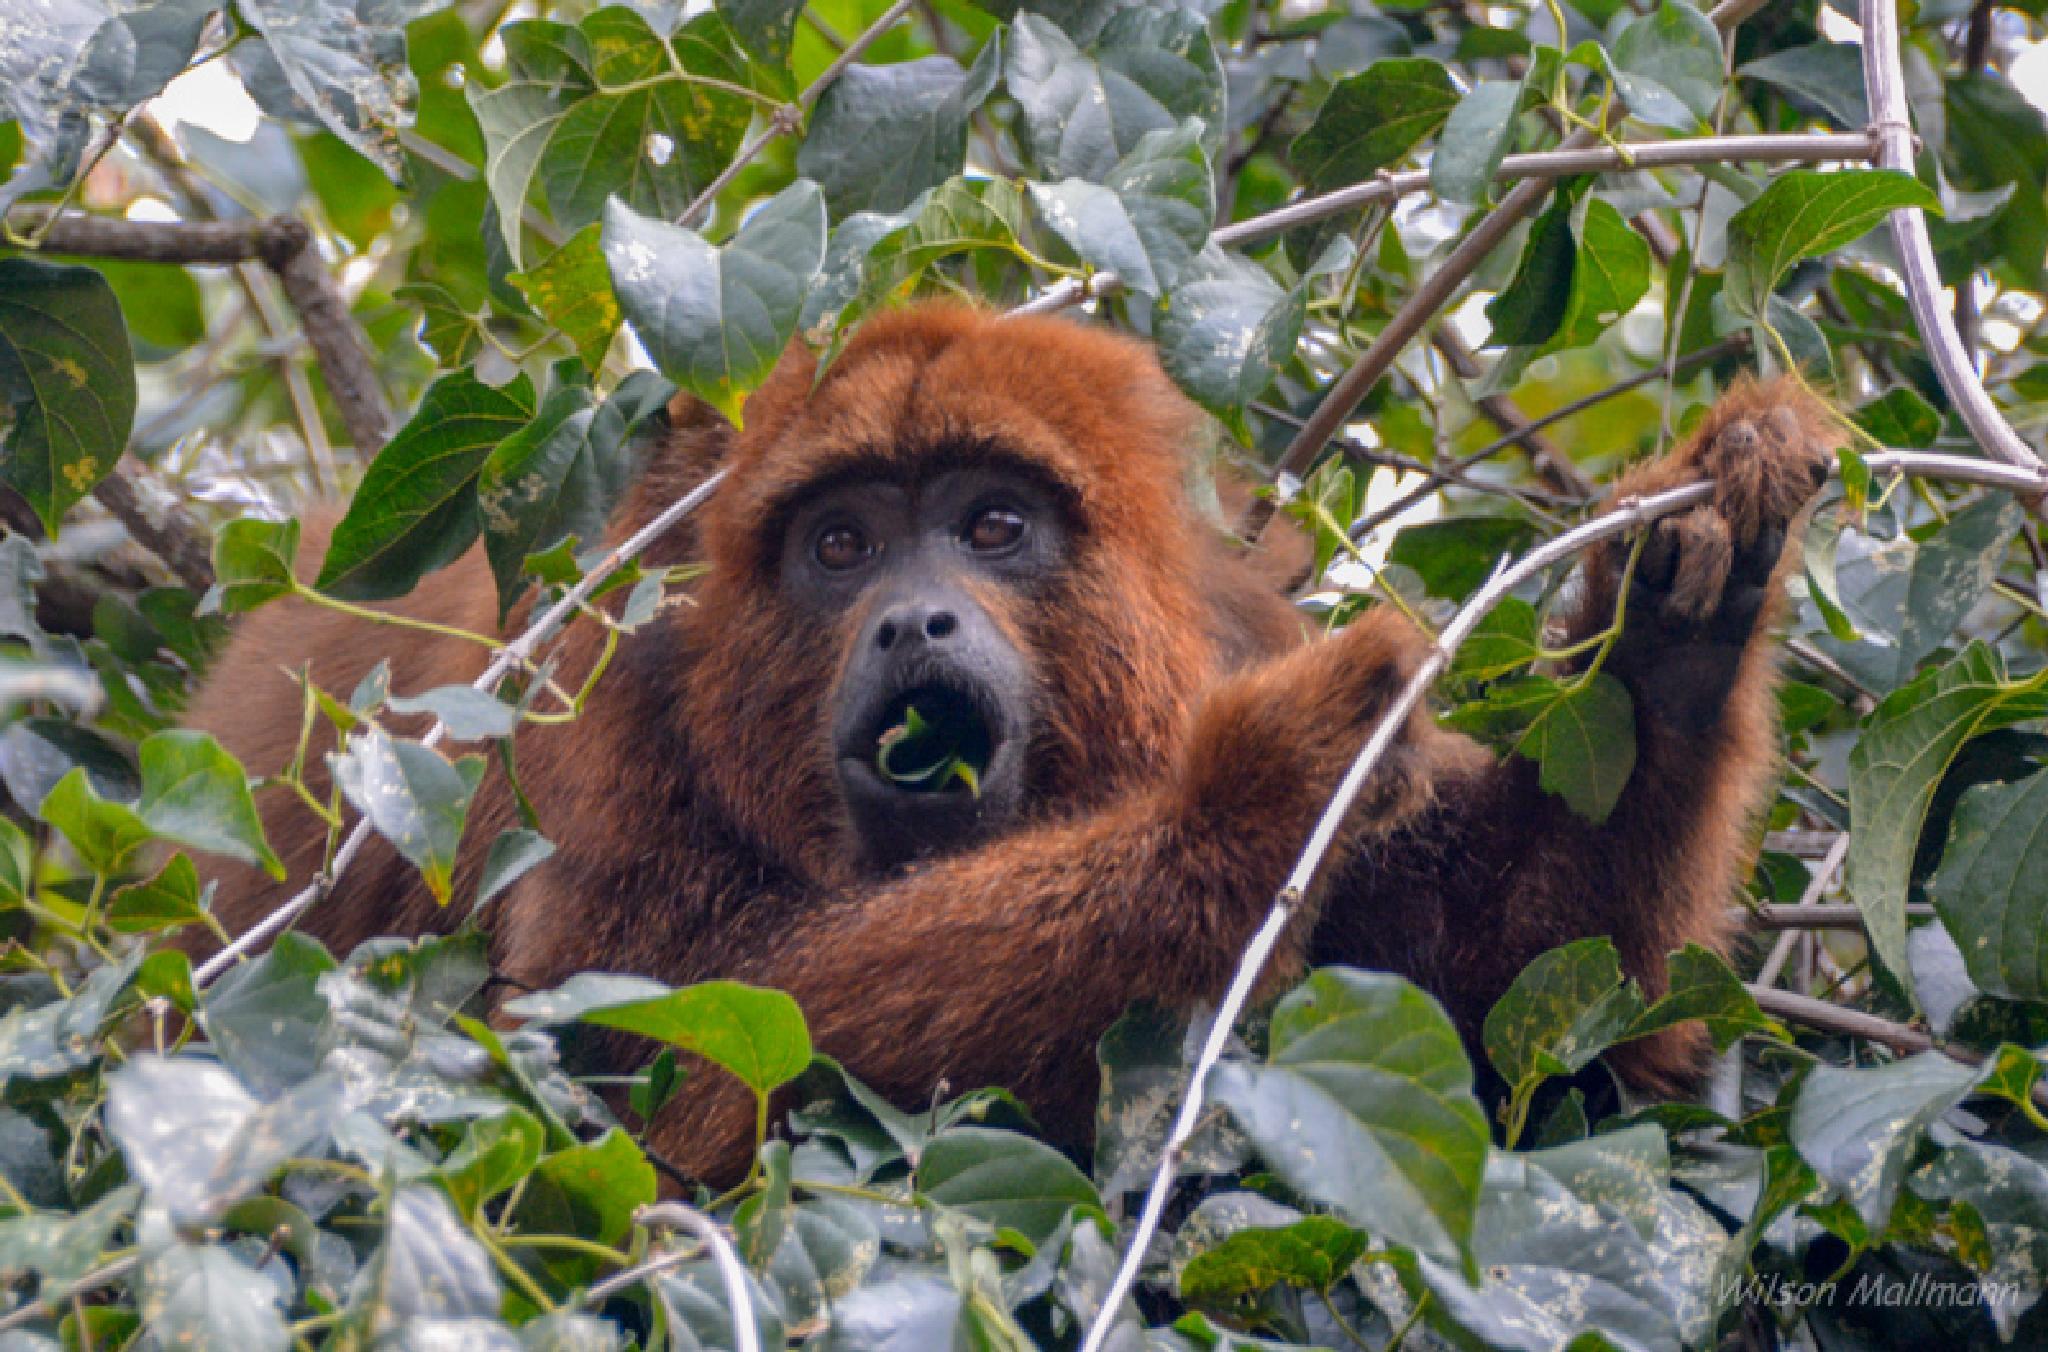 Monkey by Wilson Mallmann